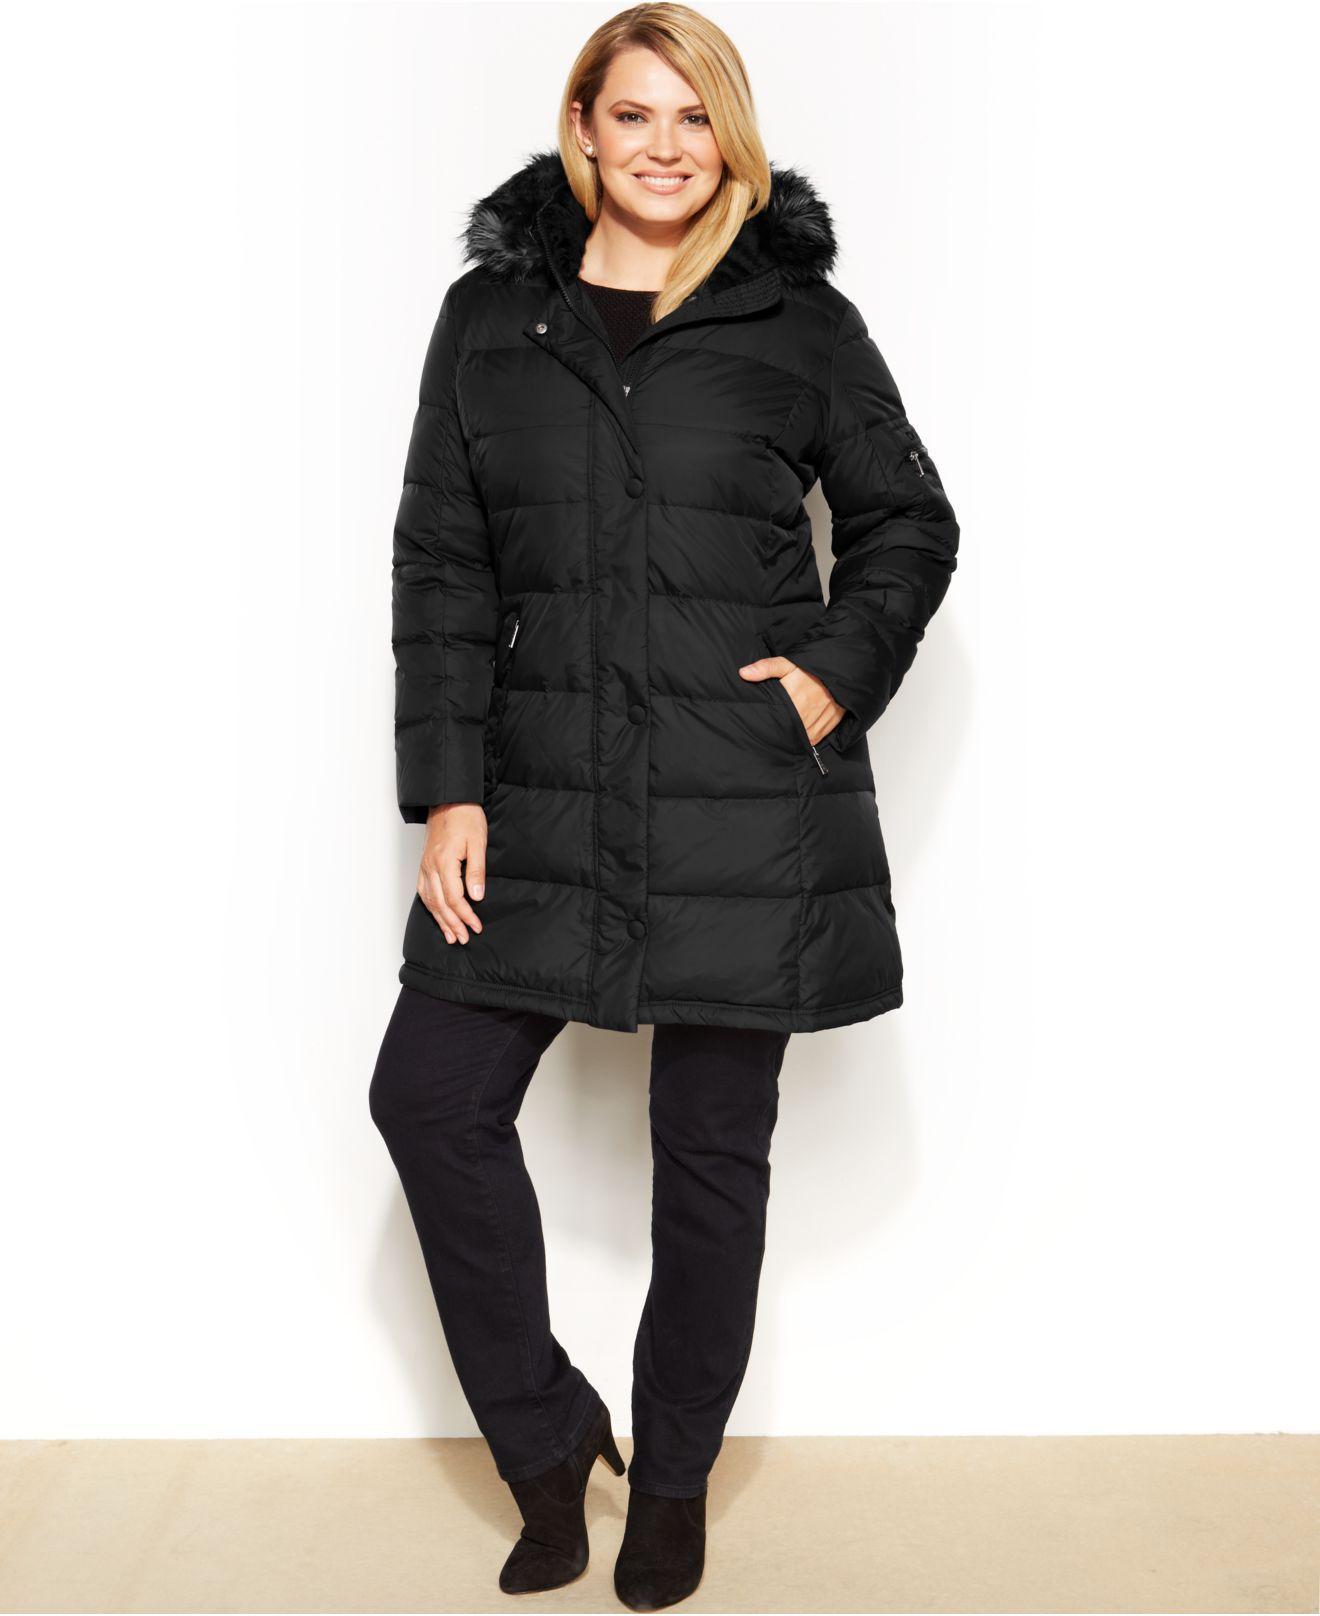 Unusual Plus Size Winter Coats : Plus Size Winter Coats1 | Unusual ...